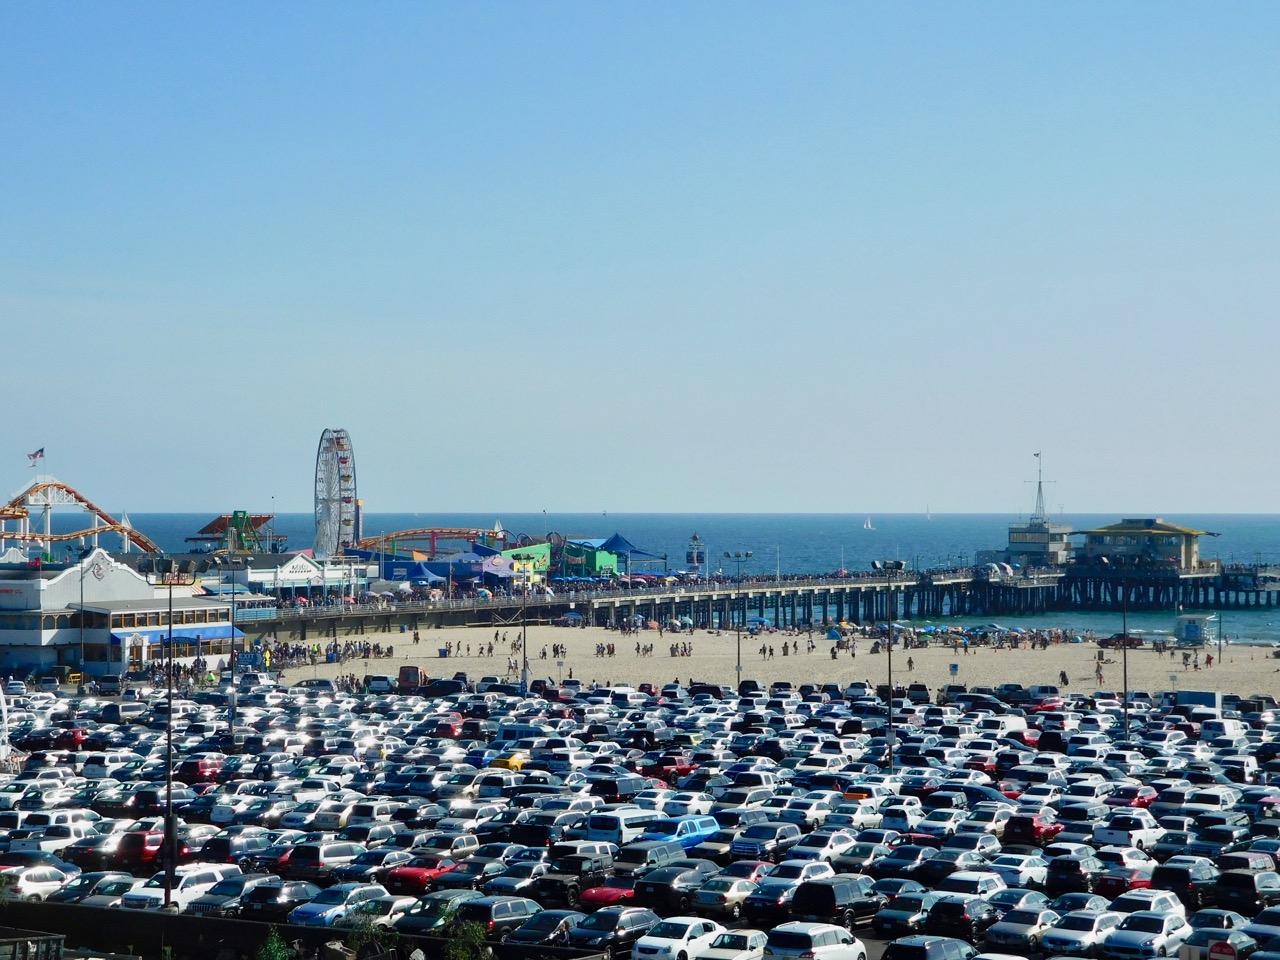 3 Days in L.A. - Santa Monica Beach (1)